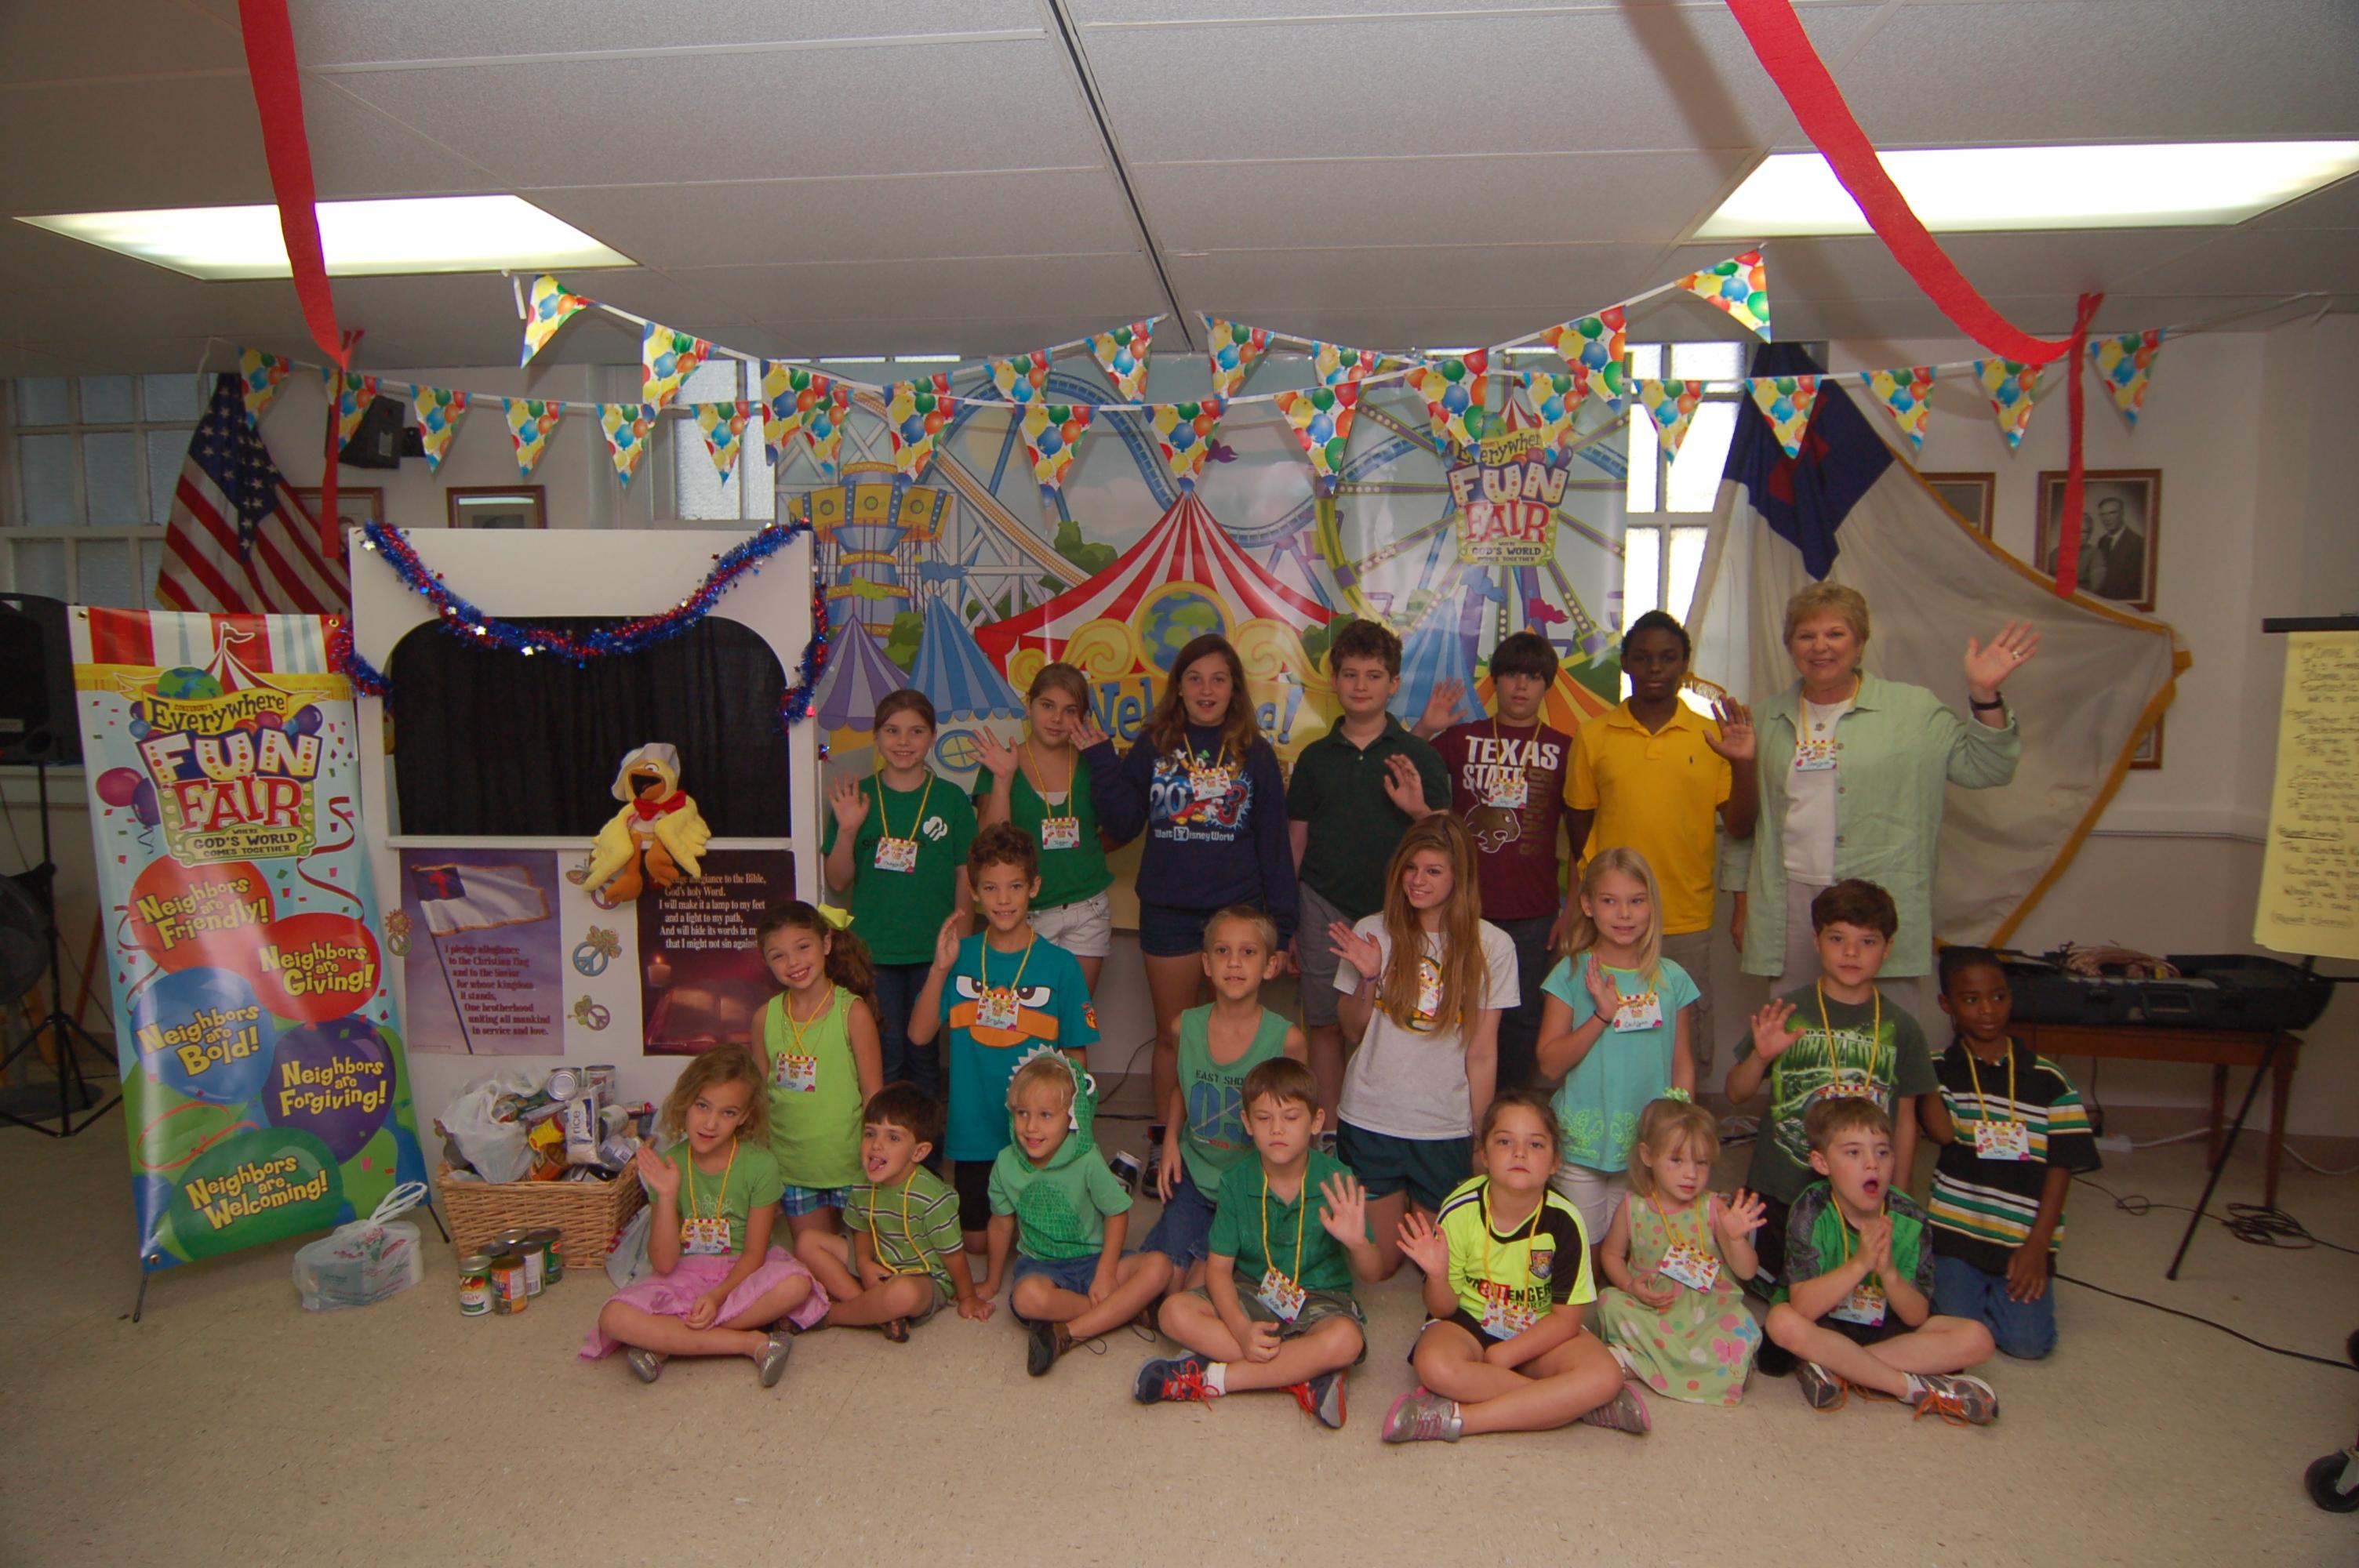 Vacation Bible School Last Days Group Photo